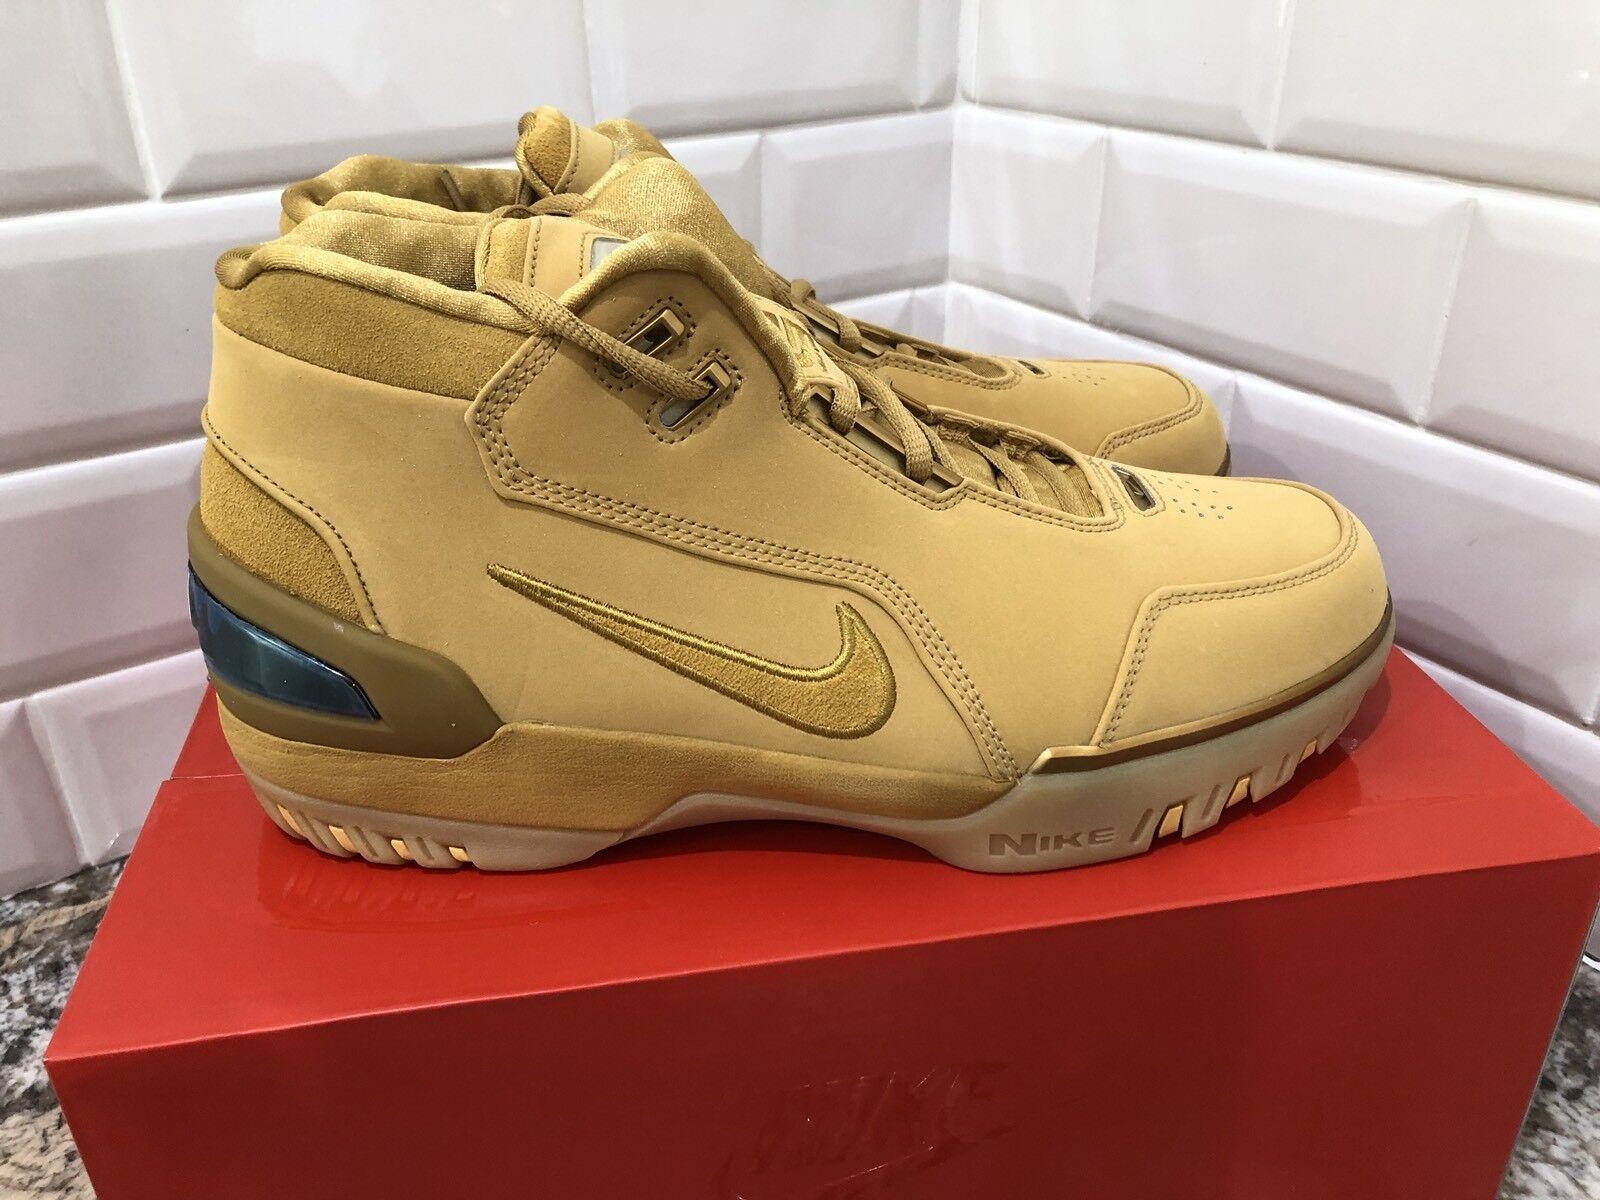 Nike zoom generazione asg qs retrò lebron james (10 aq0110-700 oro Uomo sz